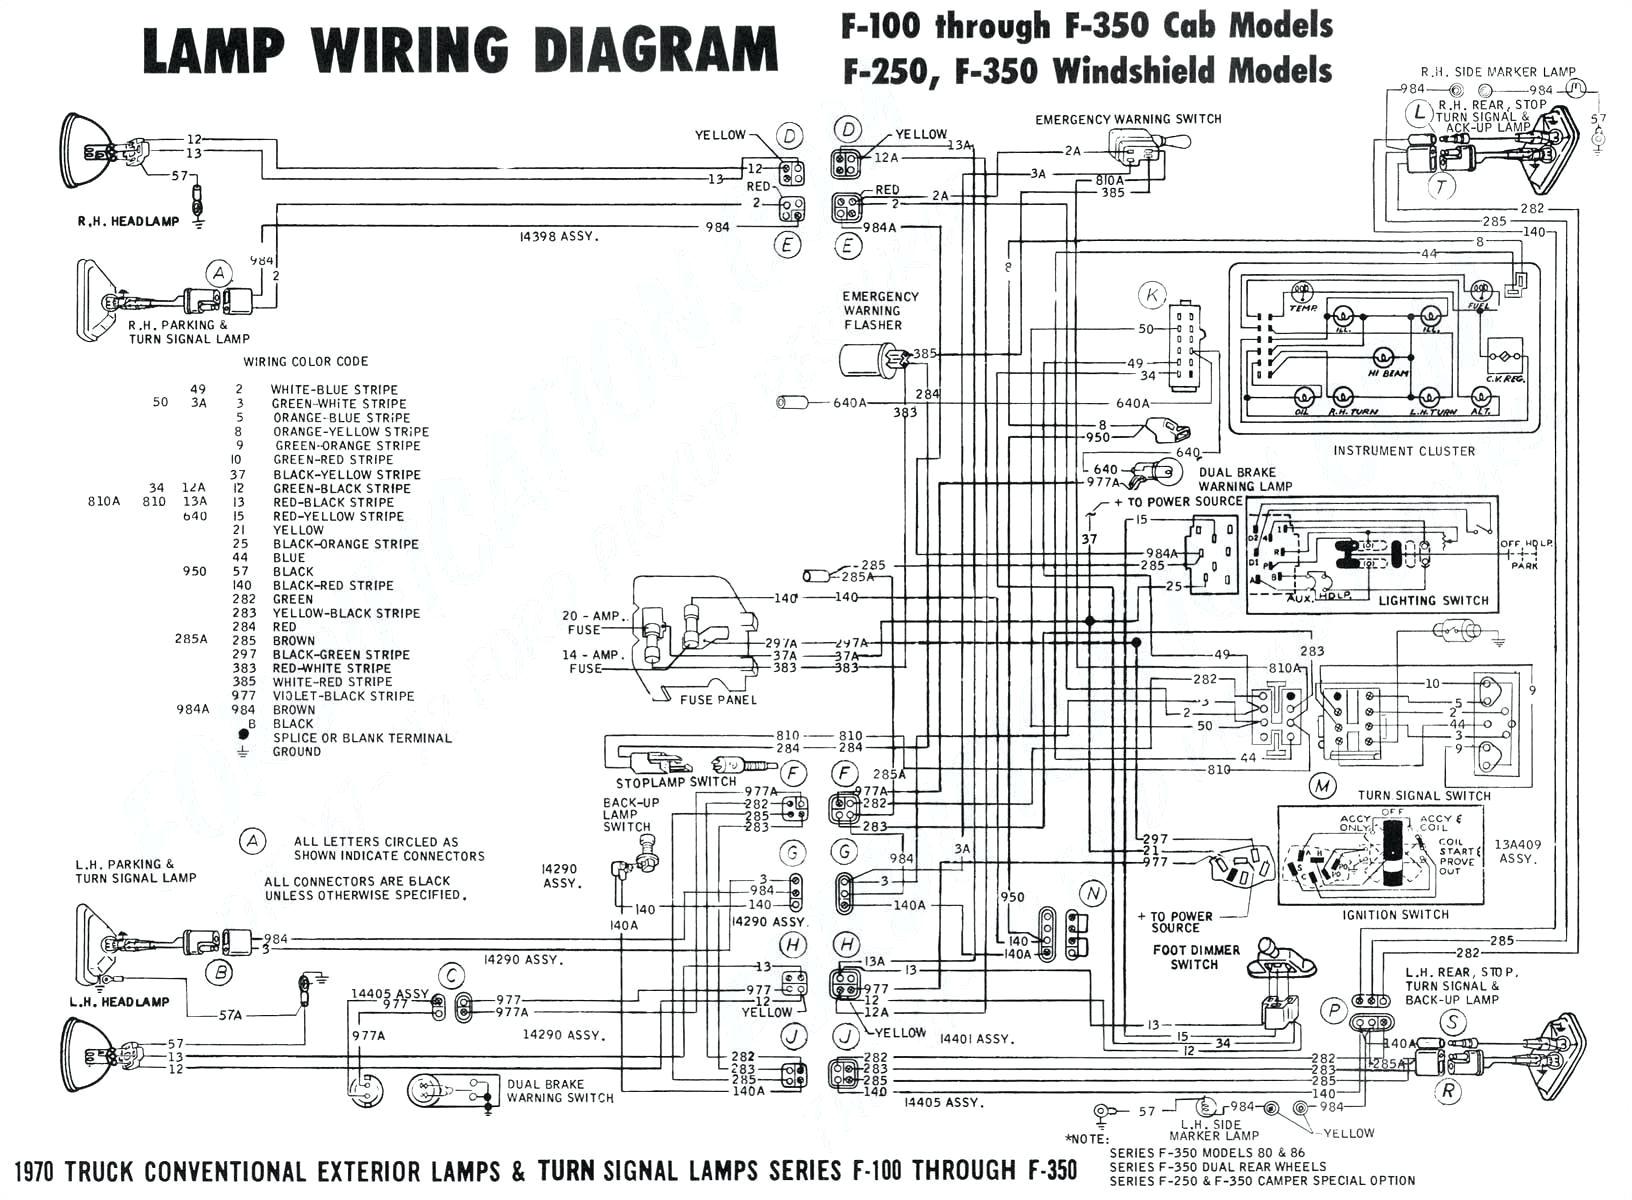 2008 toyota Tundra Fog Light Wiring Diagram Suzuki Dt40 Wiring Diagram Wiring Library